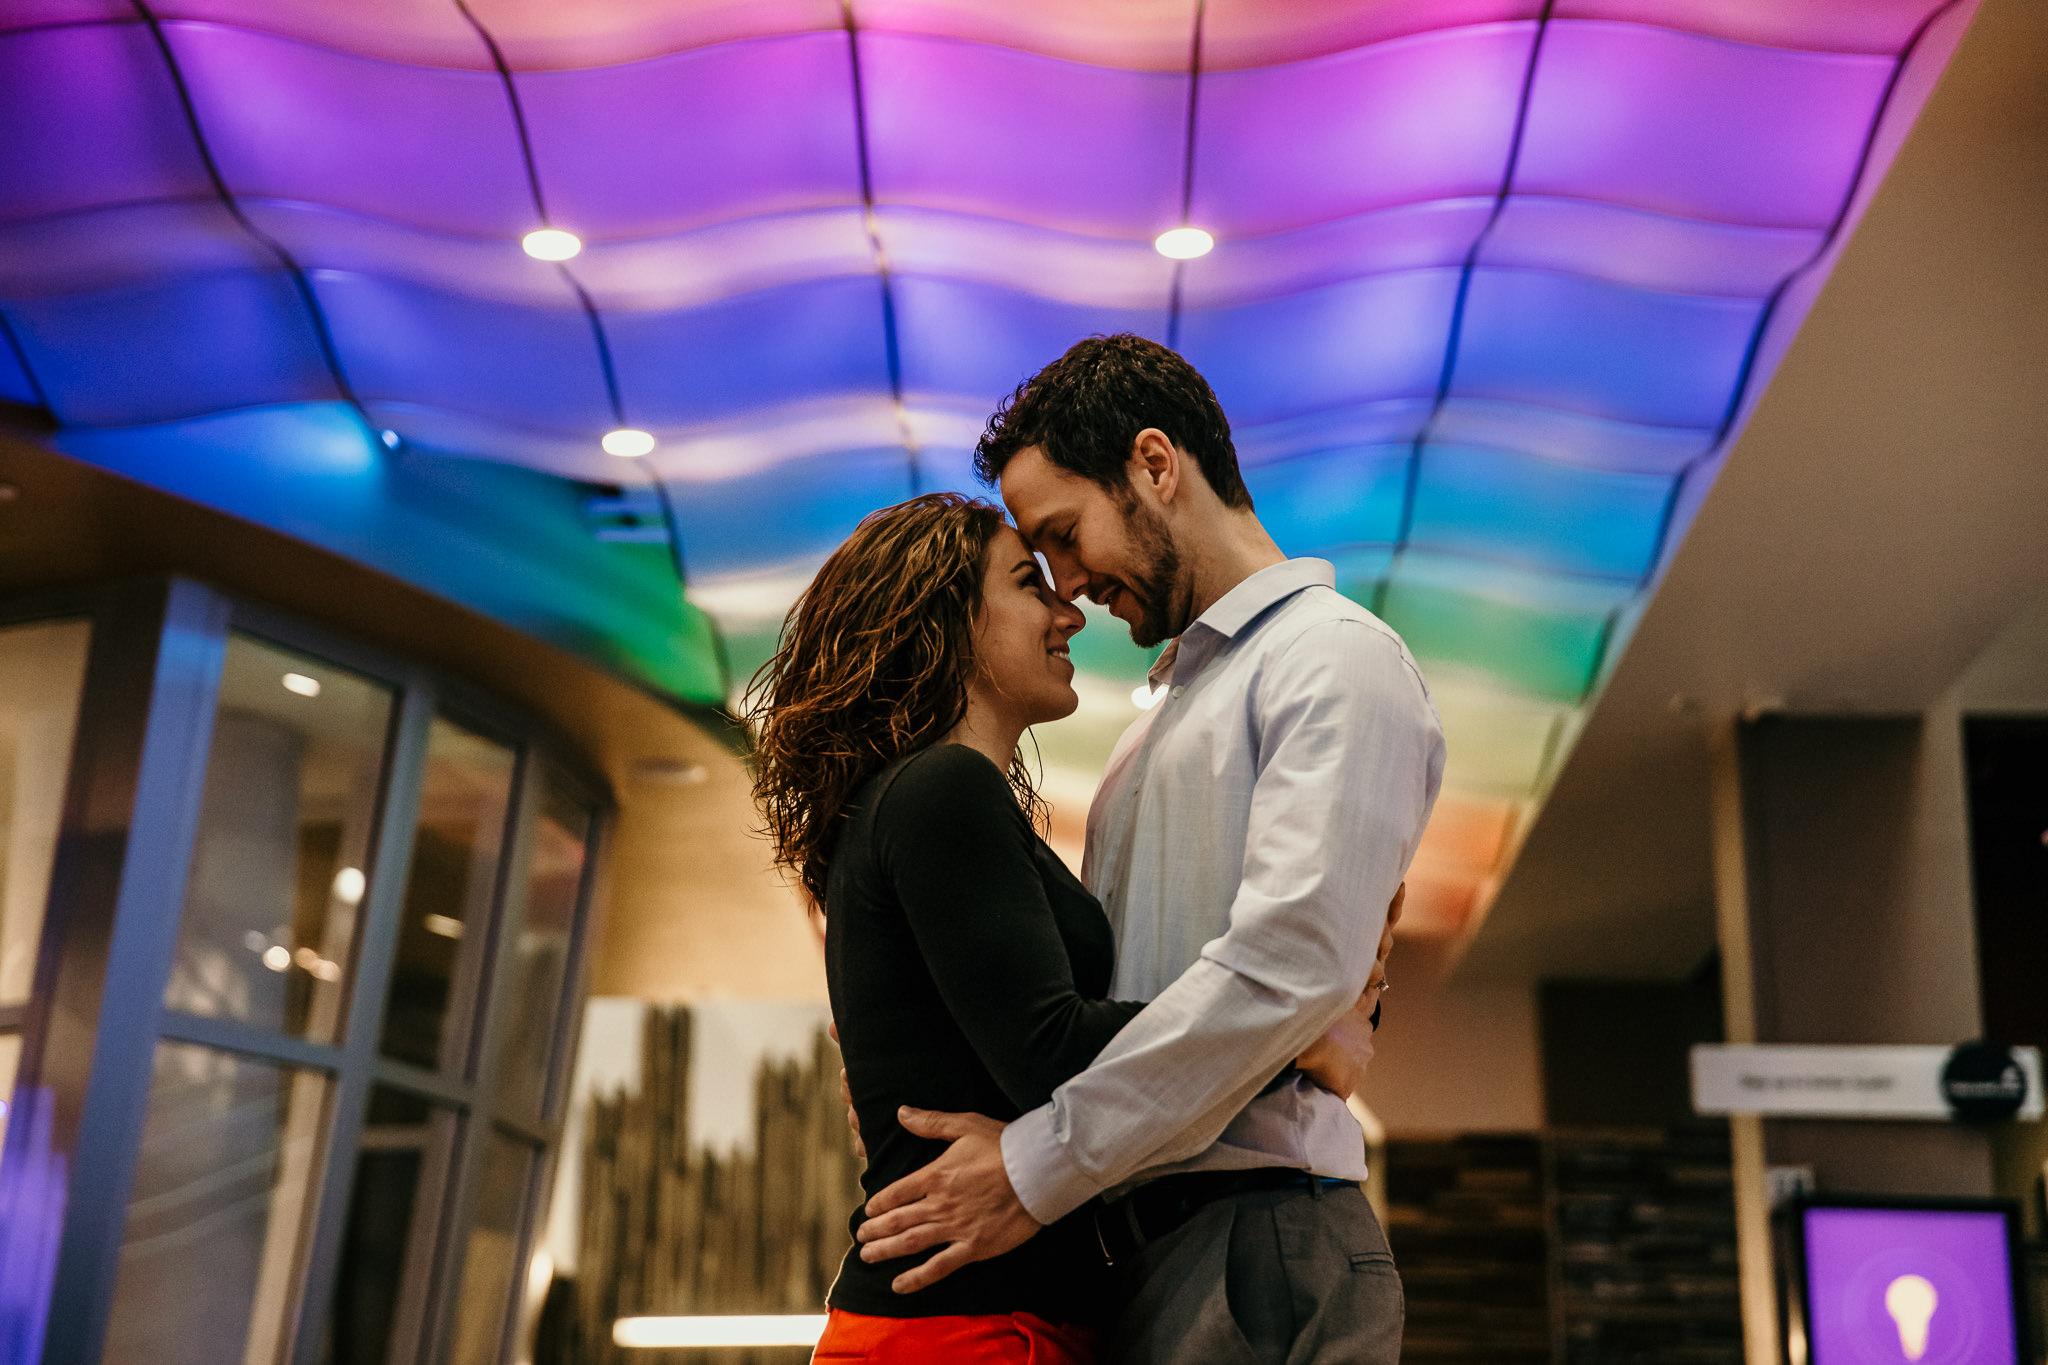 Engagement - Downtown Roanoke - Virginia - Wedding Photographer - Pat Cori Photography-26.jpg